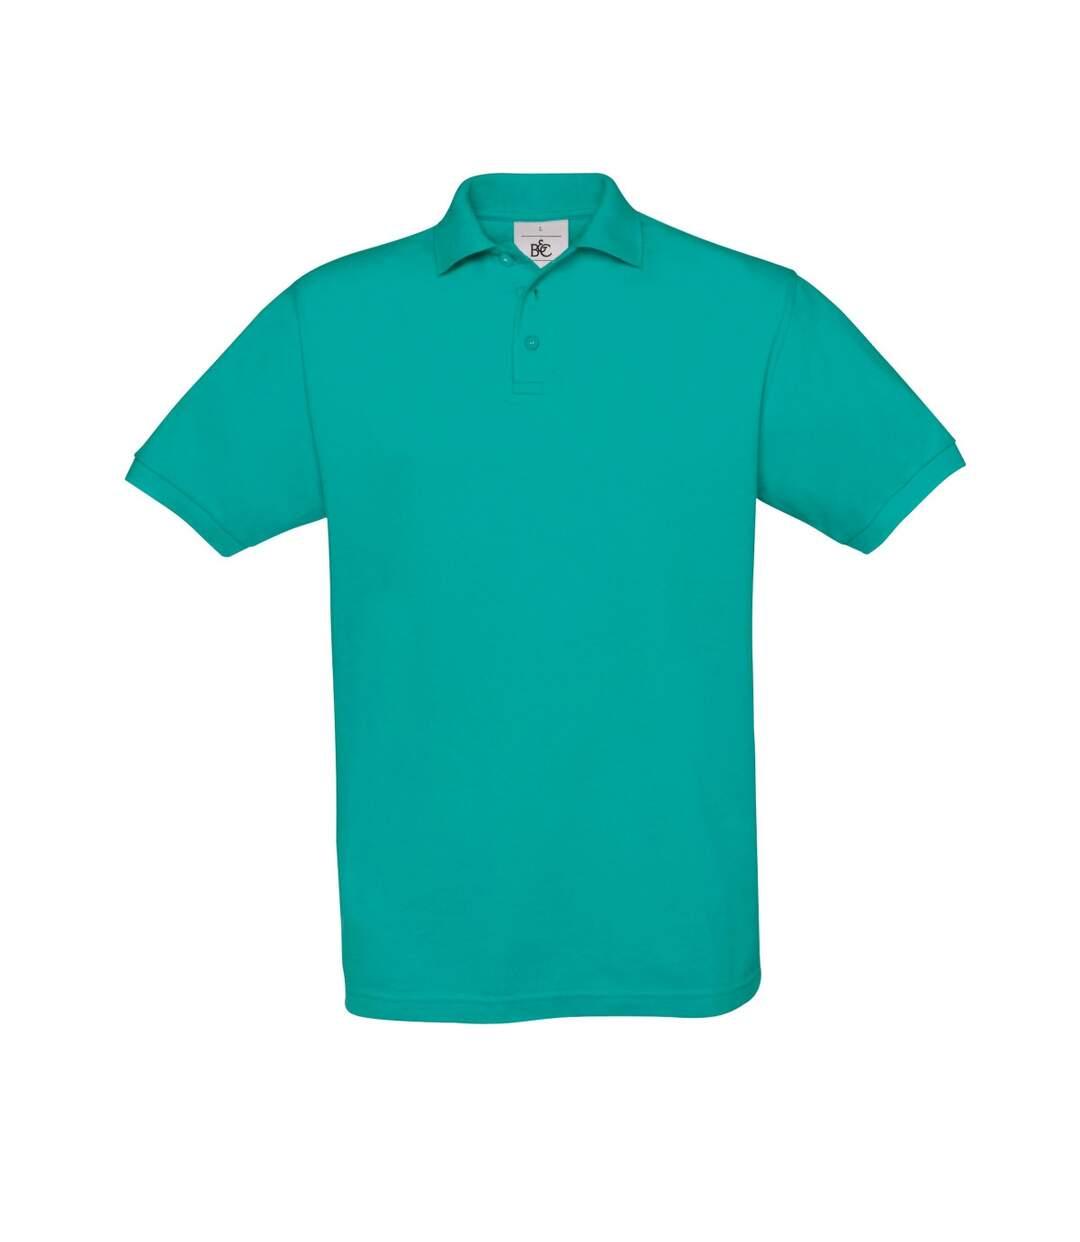 B&C Safran Mens Polo Shirt / Mens Short Sleeve Polo Shirts (Real Turquoise) - UTBC103